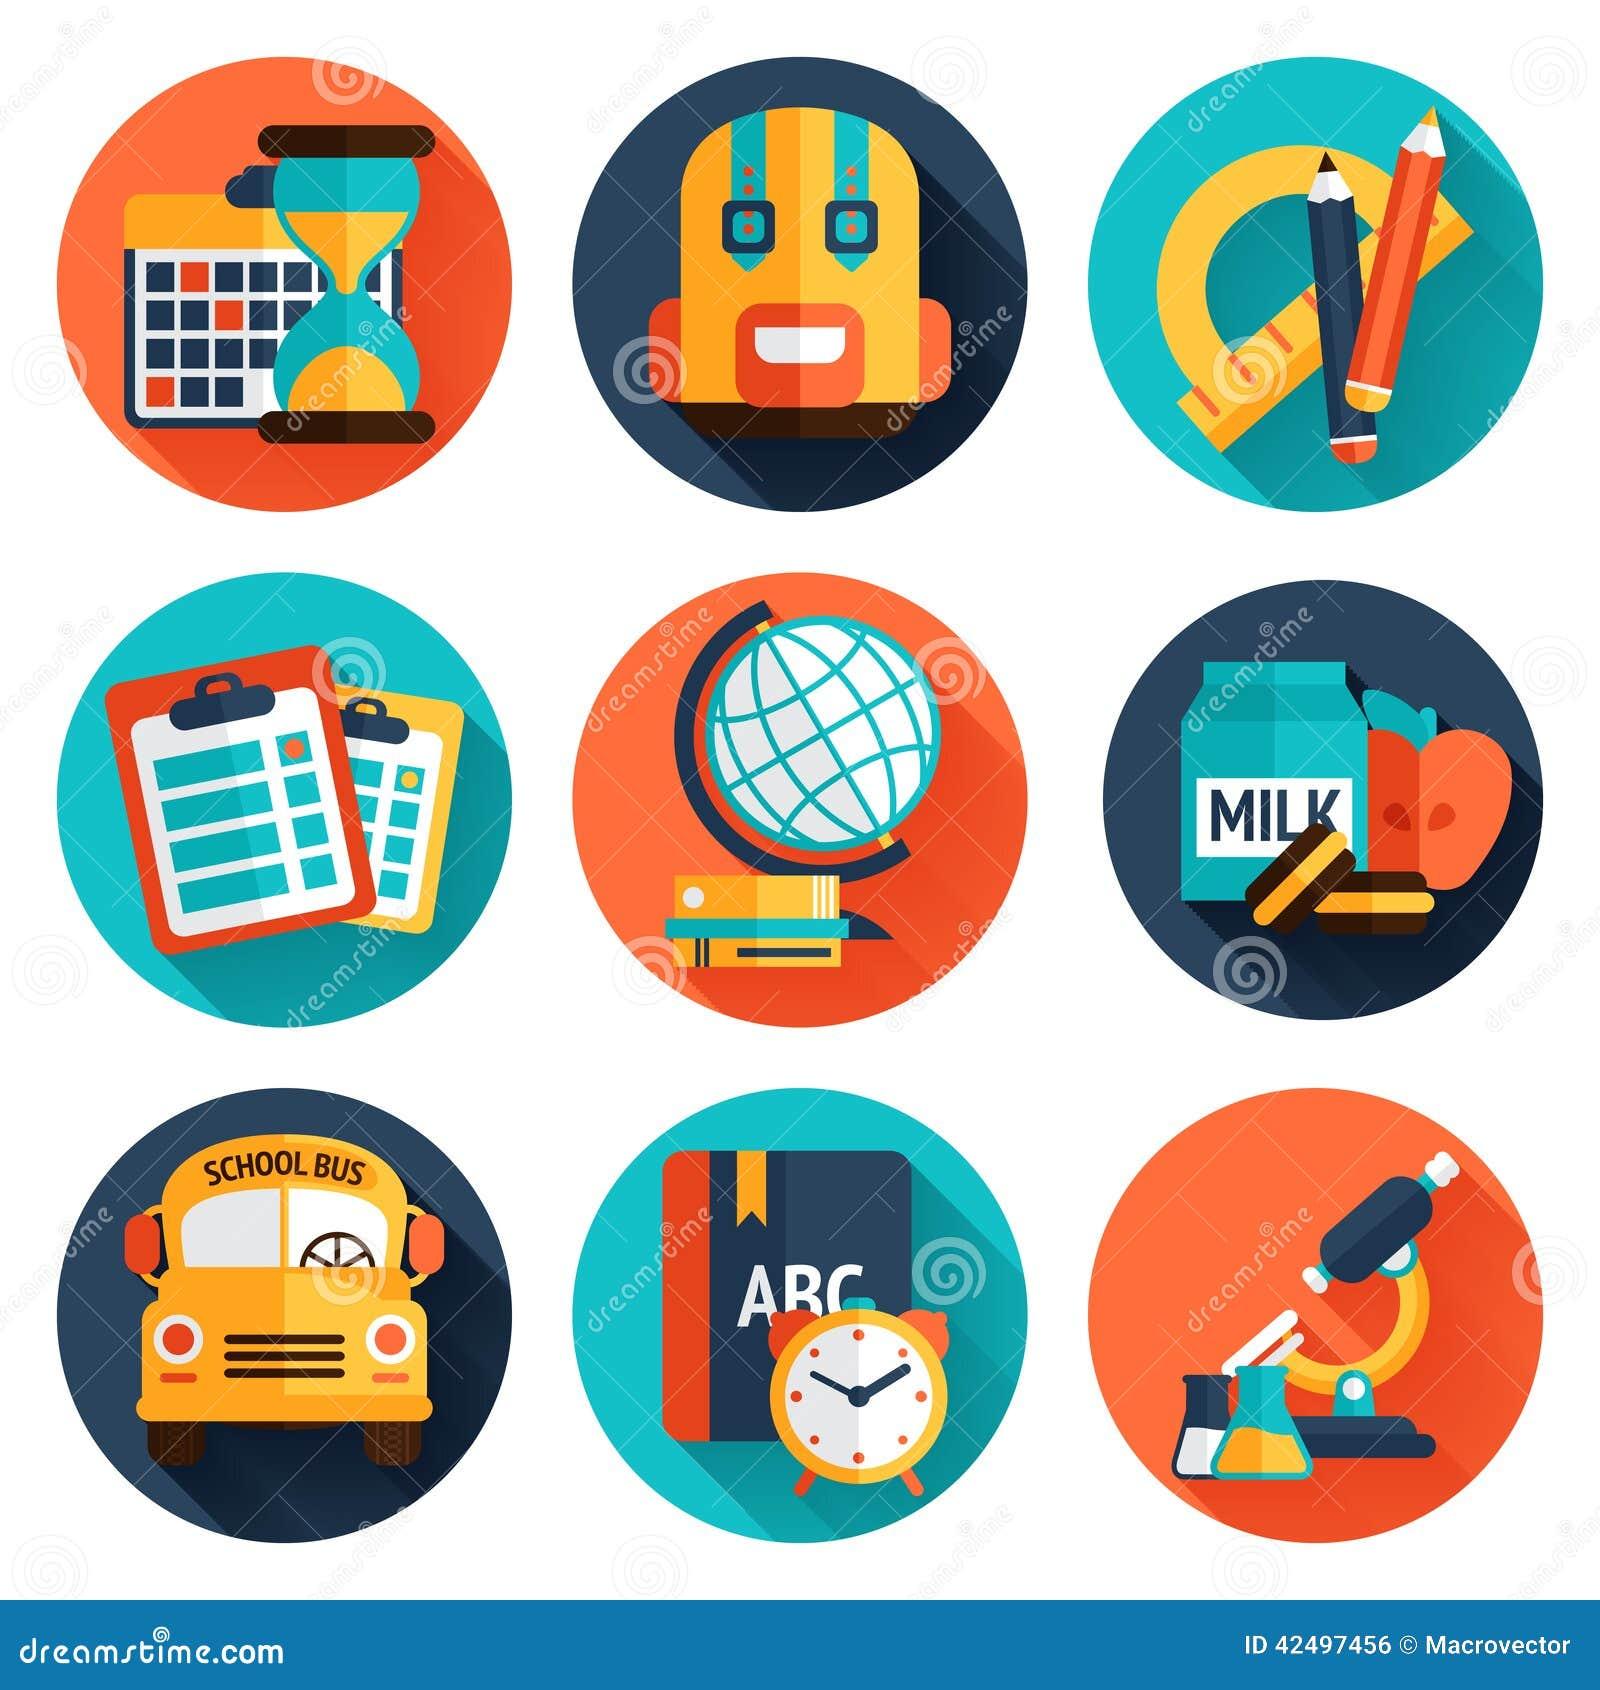 Education Flat Icons Set Stock Vector - Image: 42497456